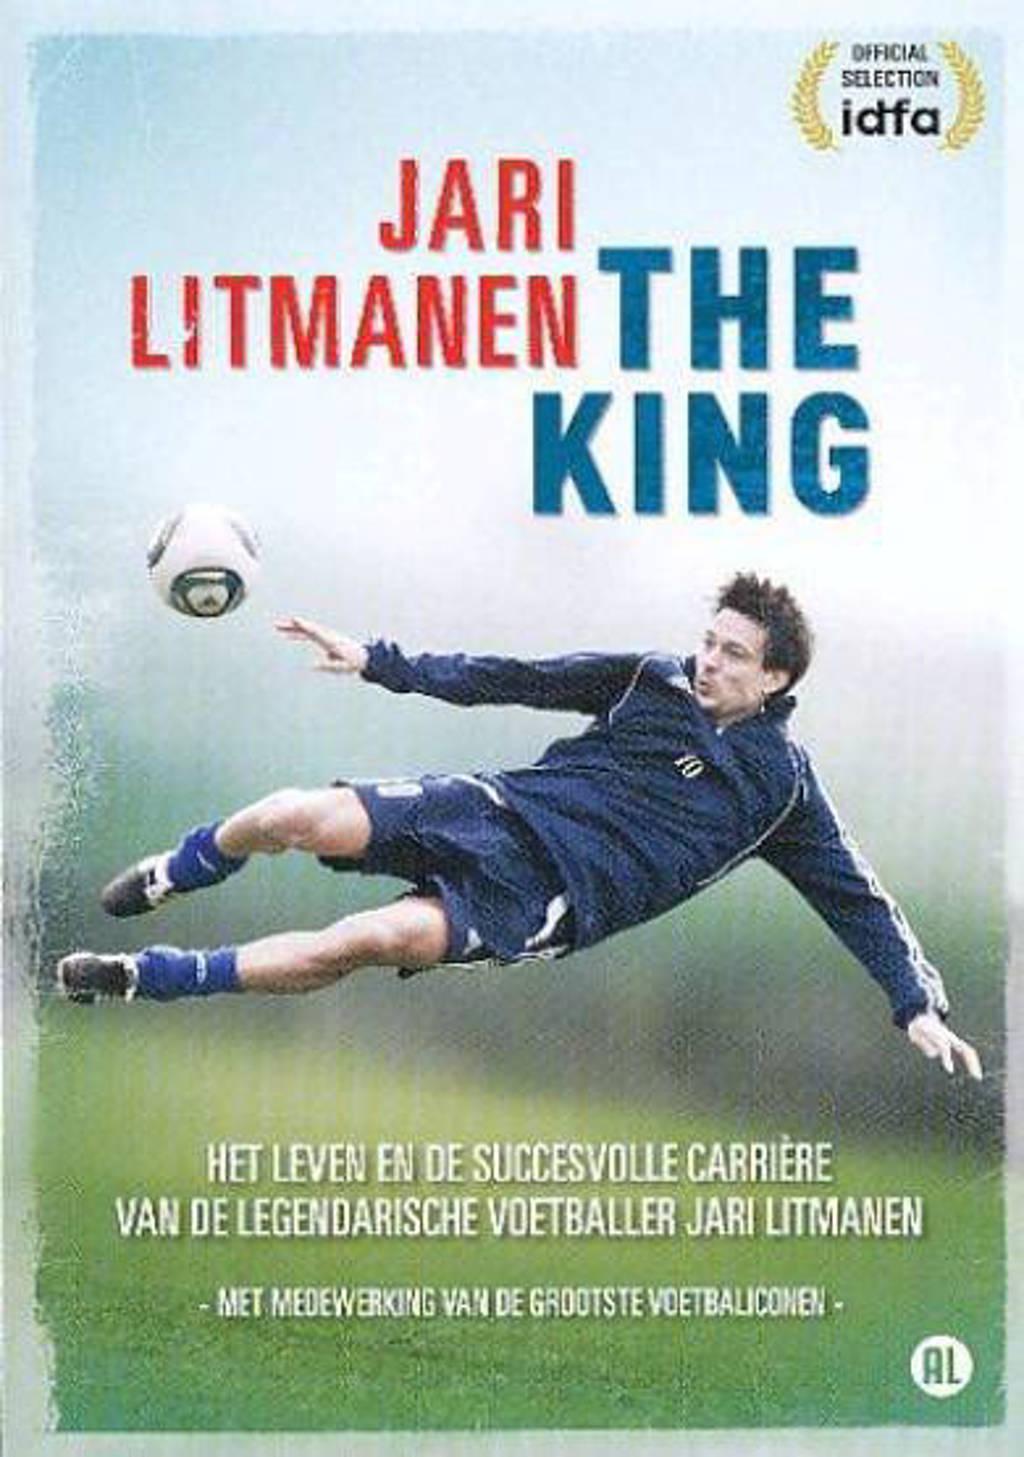 Jari Litmanen - The King (DVD)